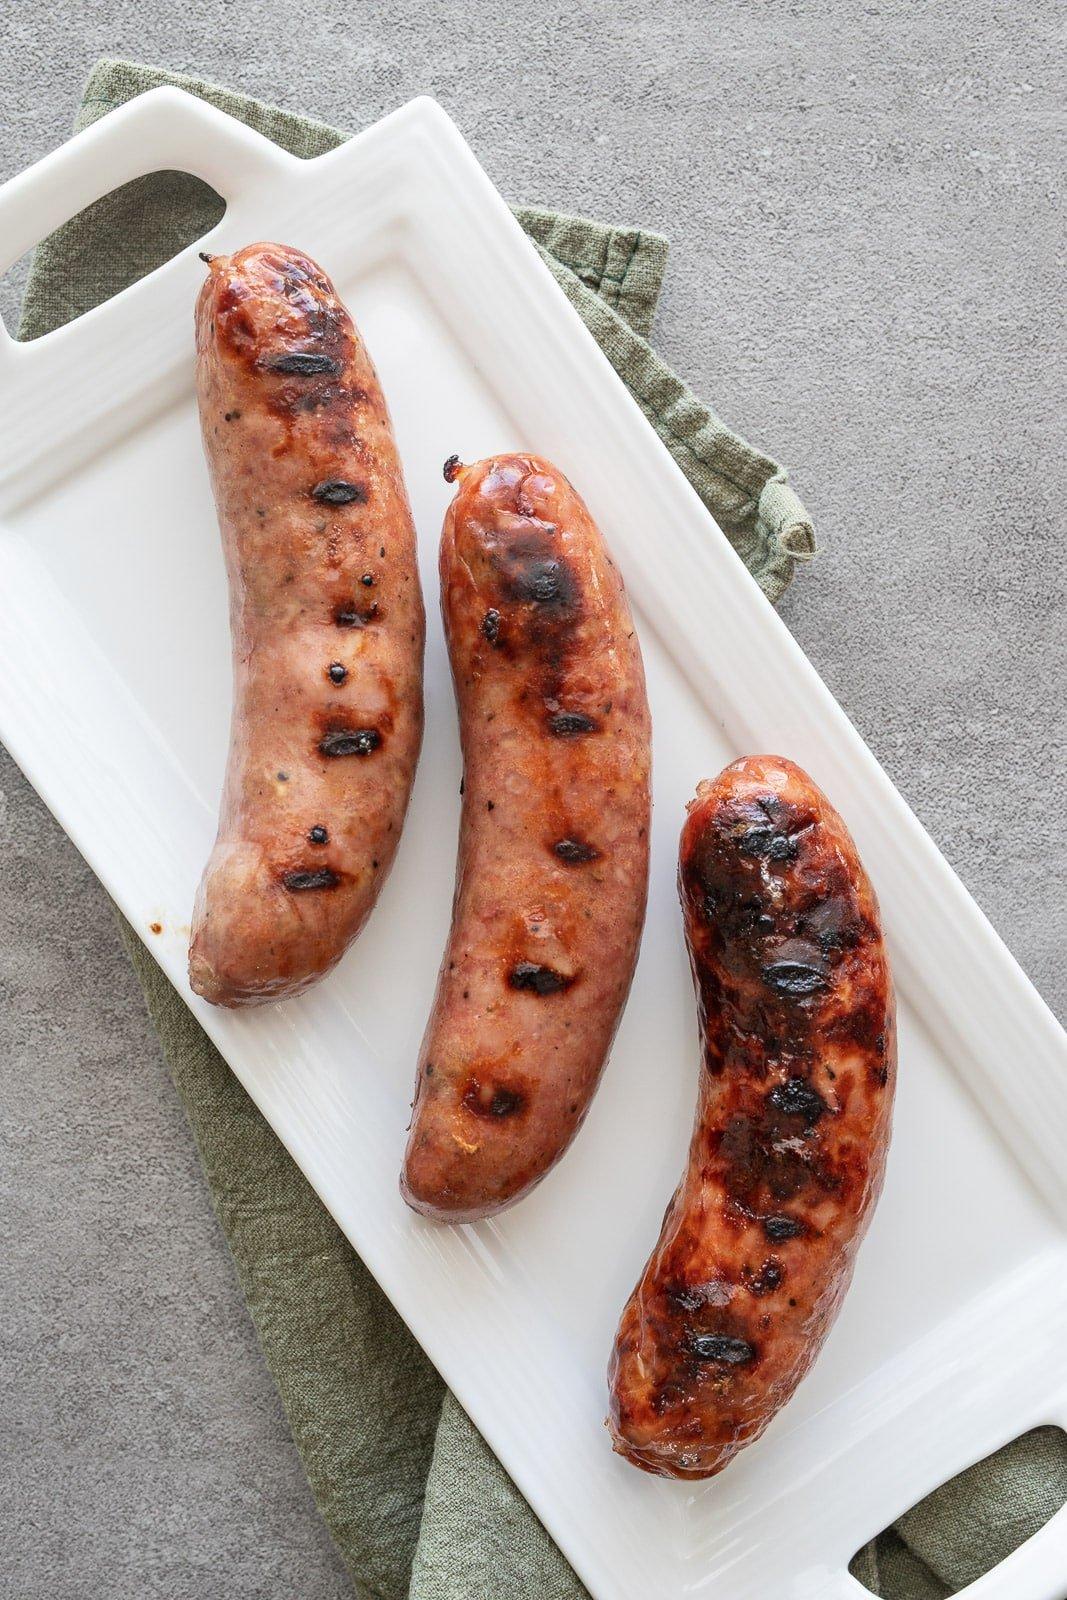 Grilled chicken sausage on a white platter.